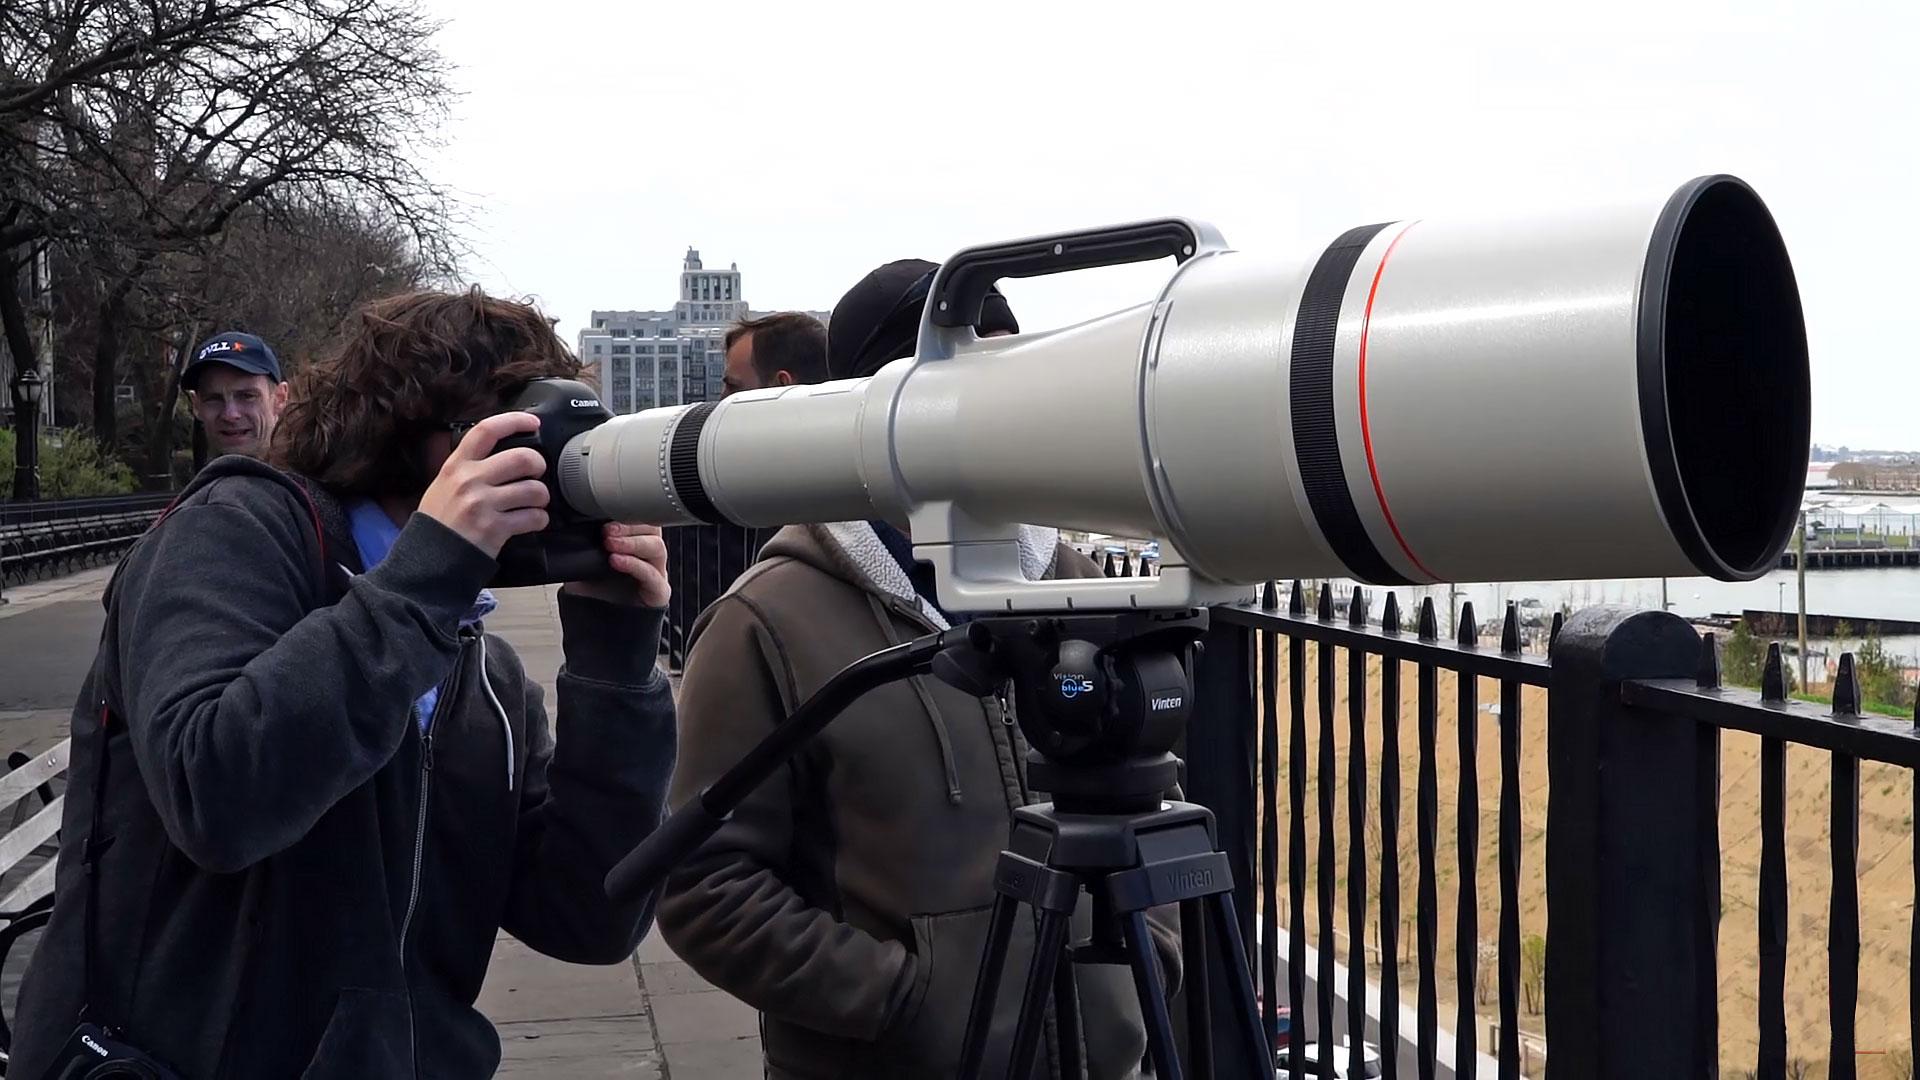 canon1200mm image